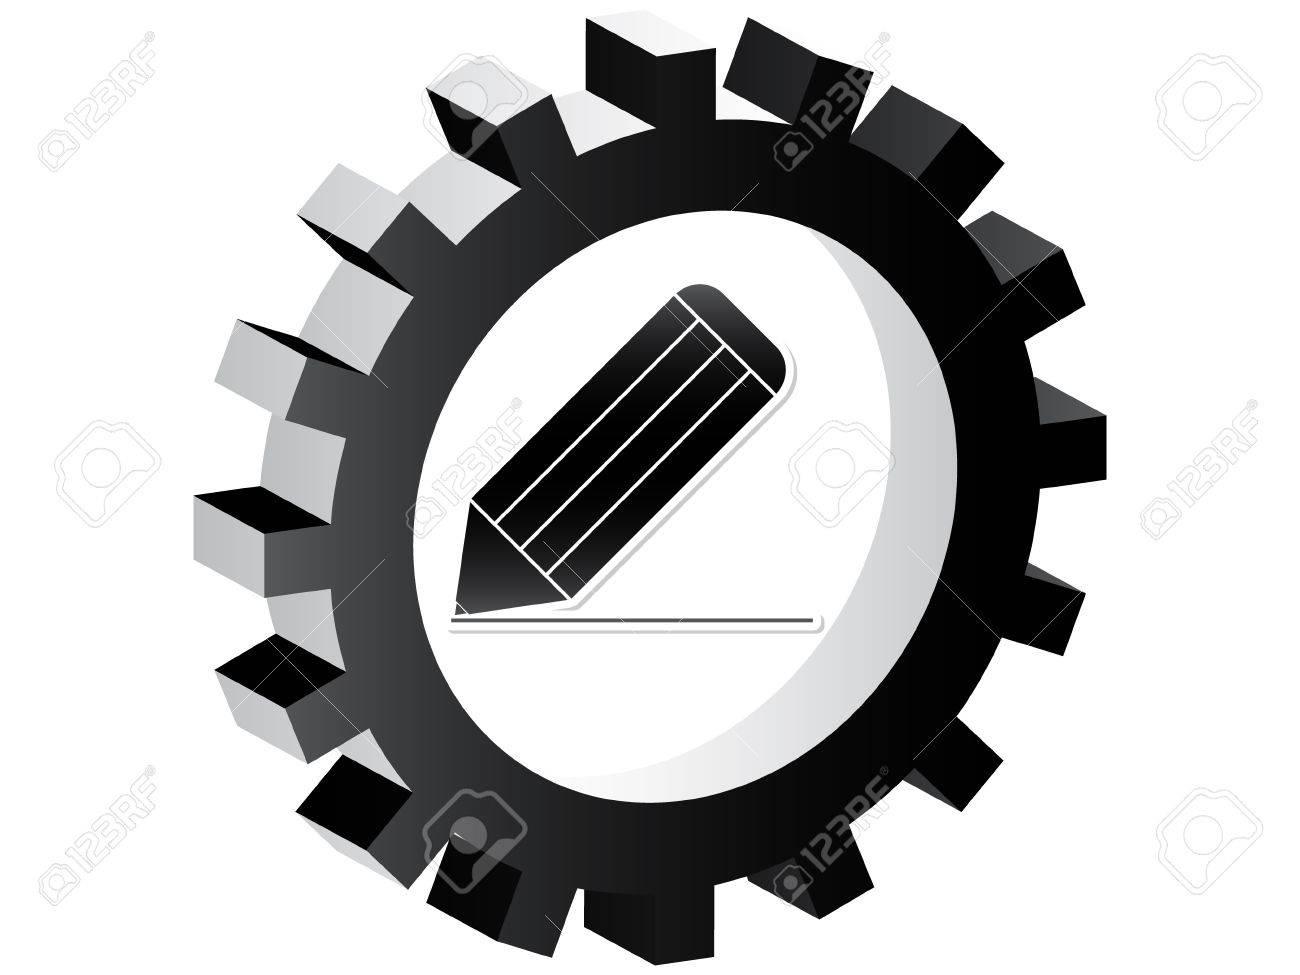 pencil icon Stock Vector - 10450740